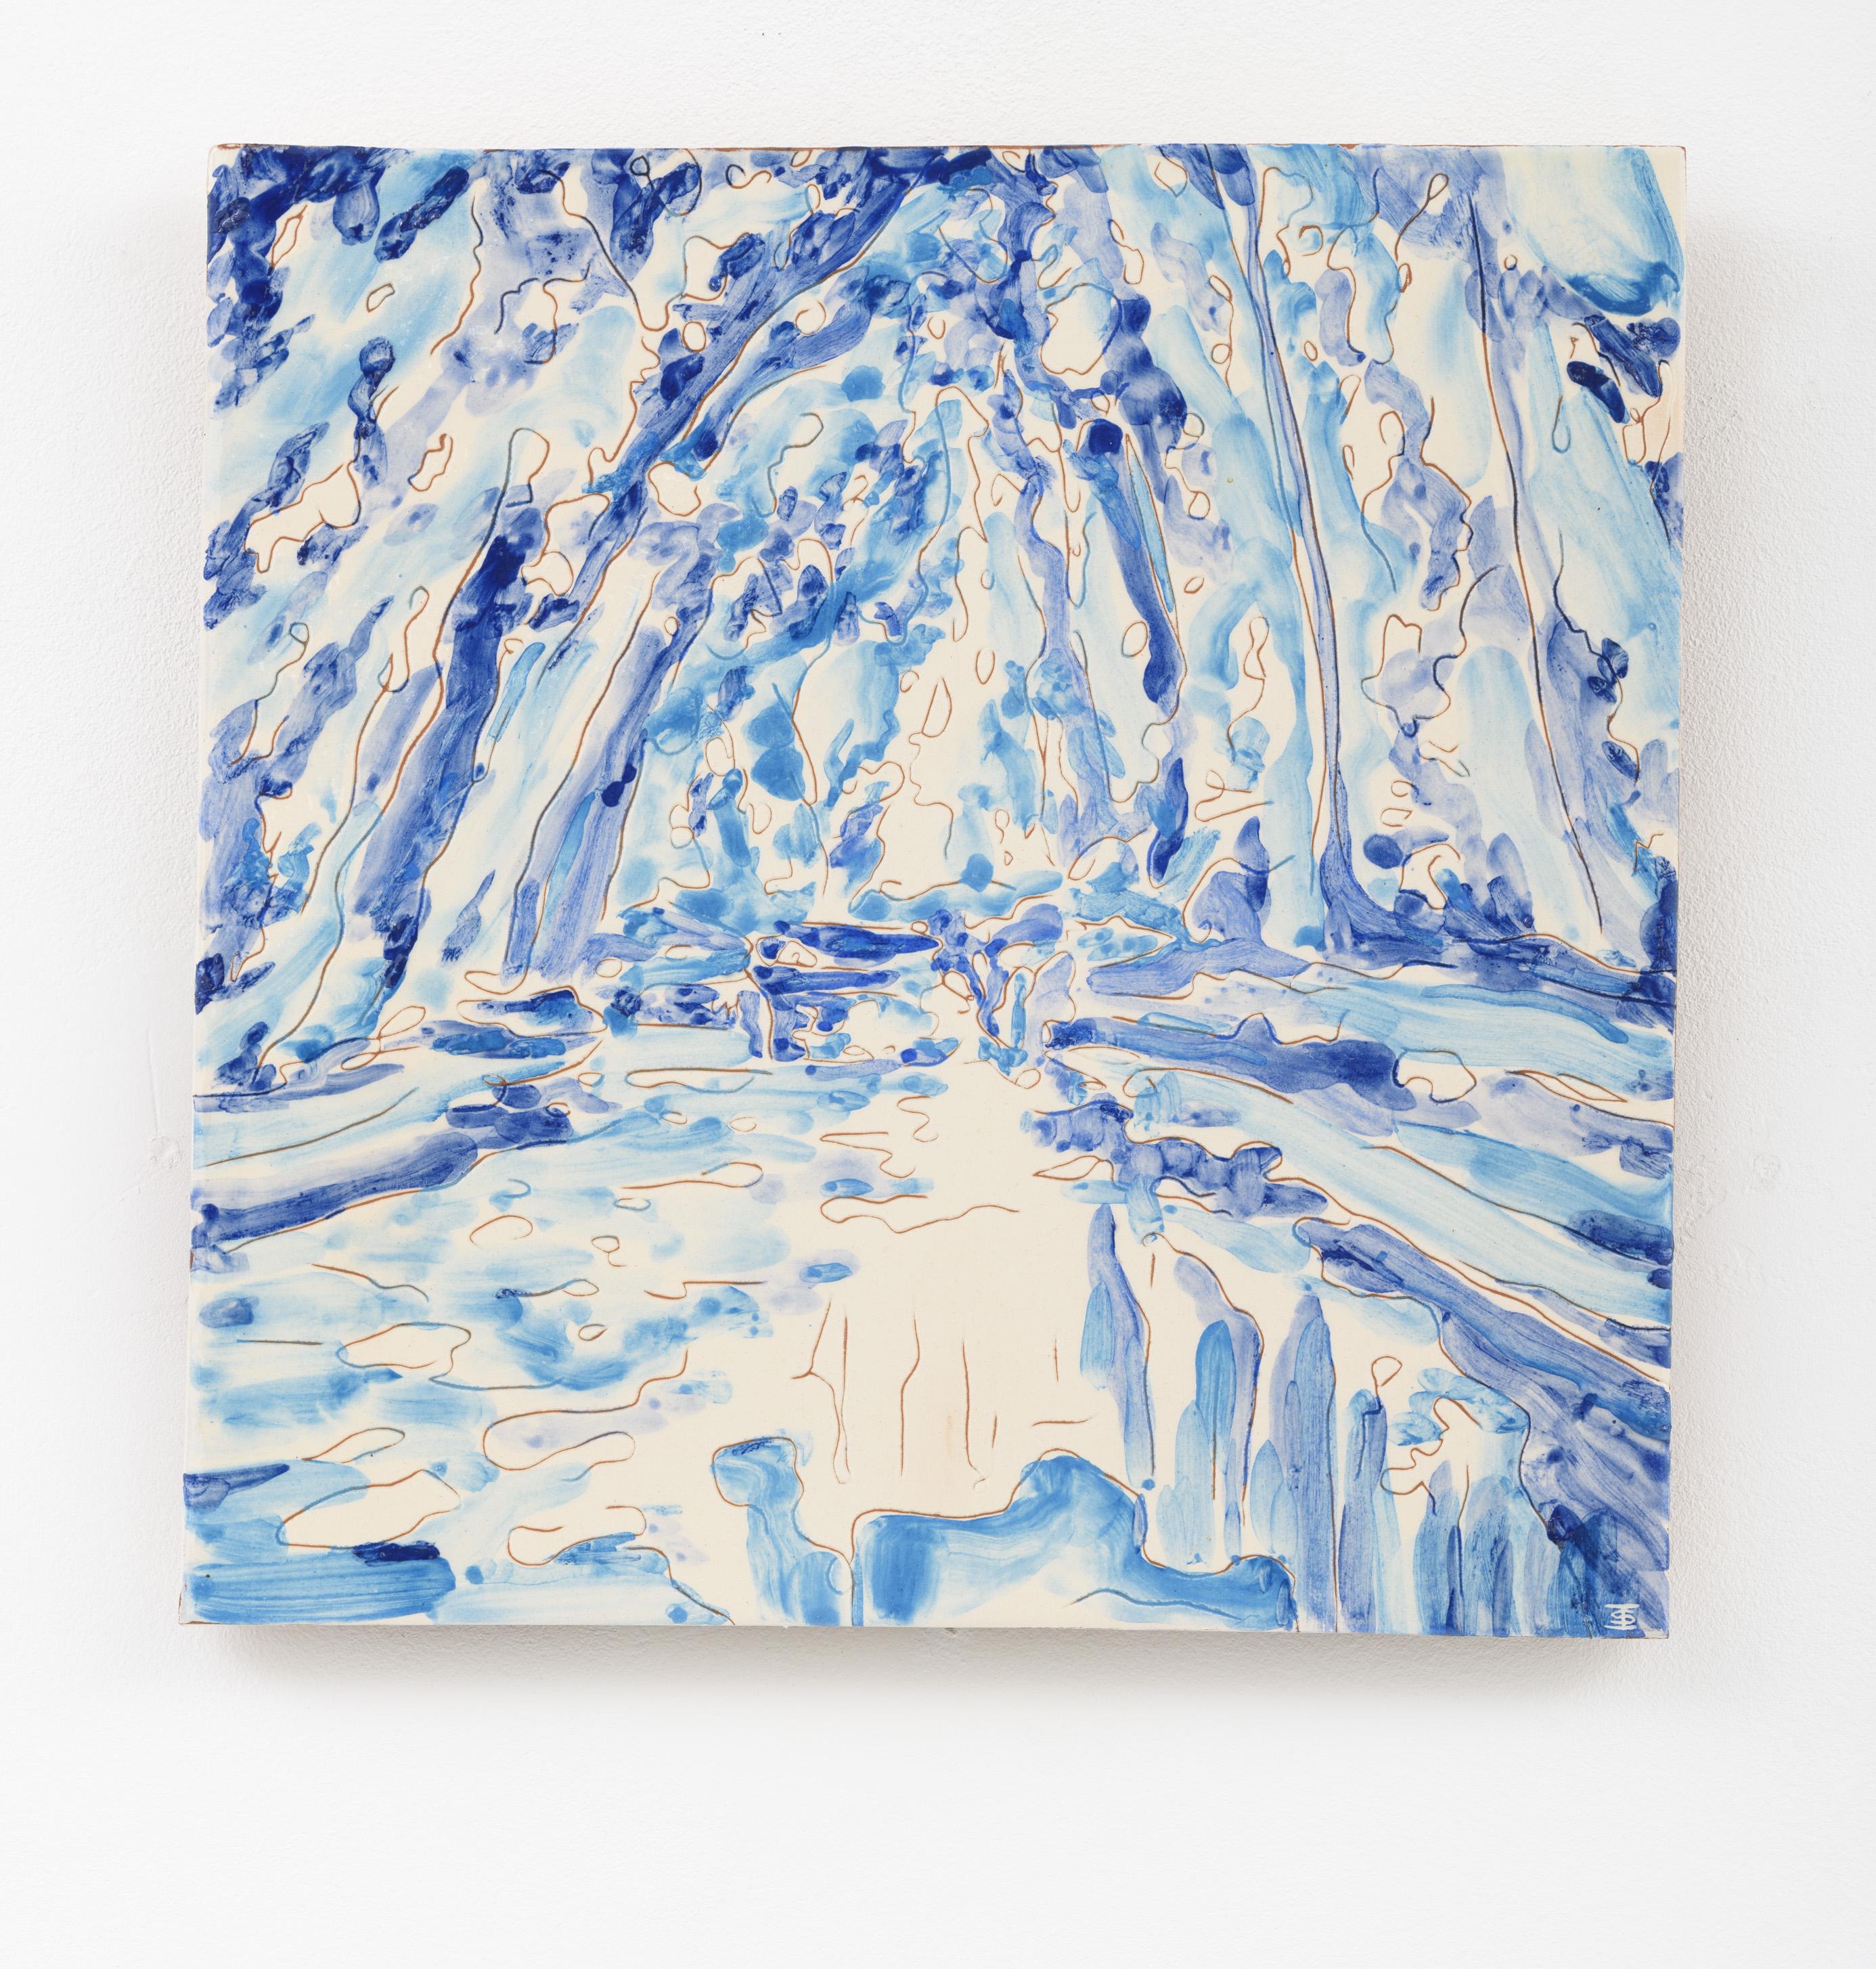 """O meu Alentejo VII"". painted ceramic tile.,, 27,5 x 27,5 cm Portugal 2015"